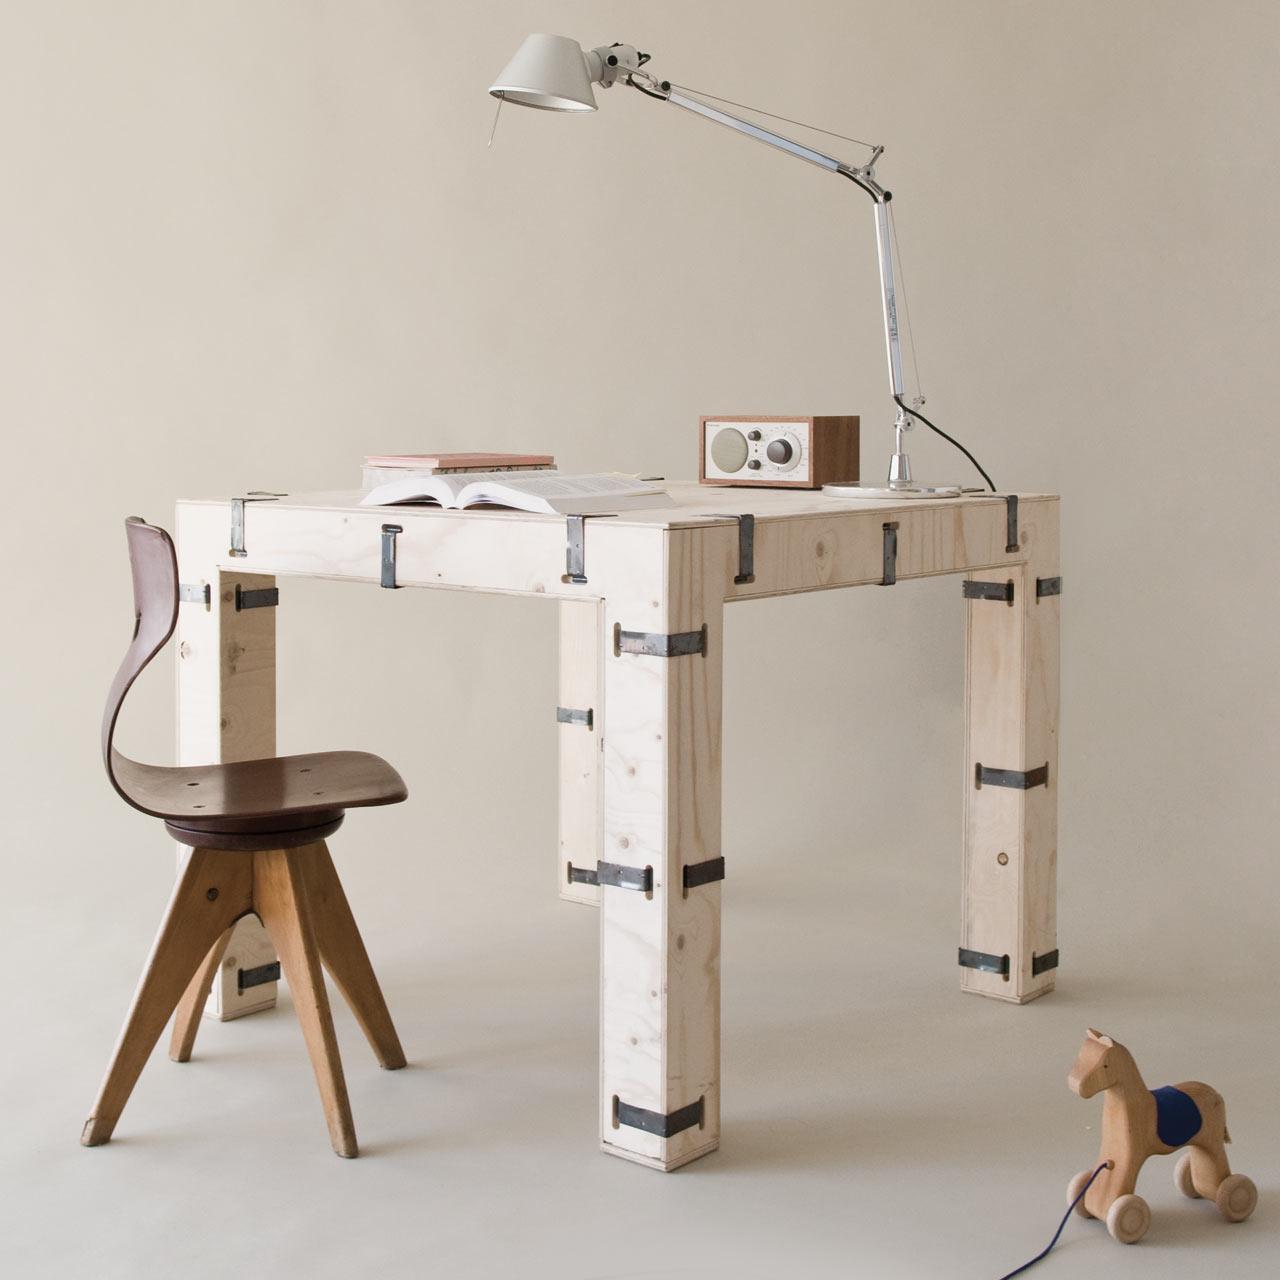 Pakiet-Modular-Furniture-hisheji (4)